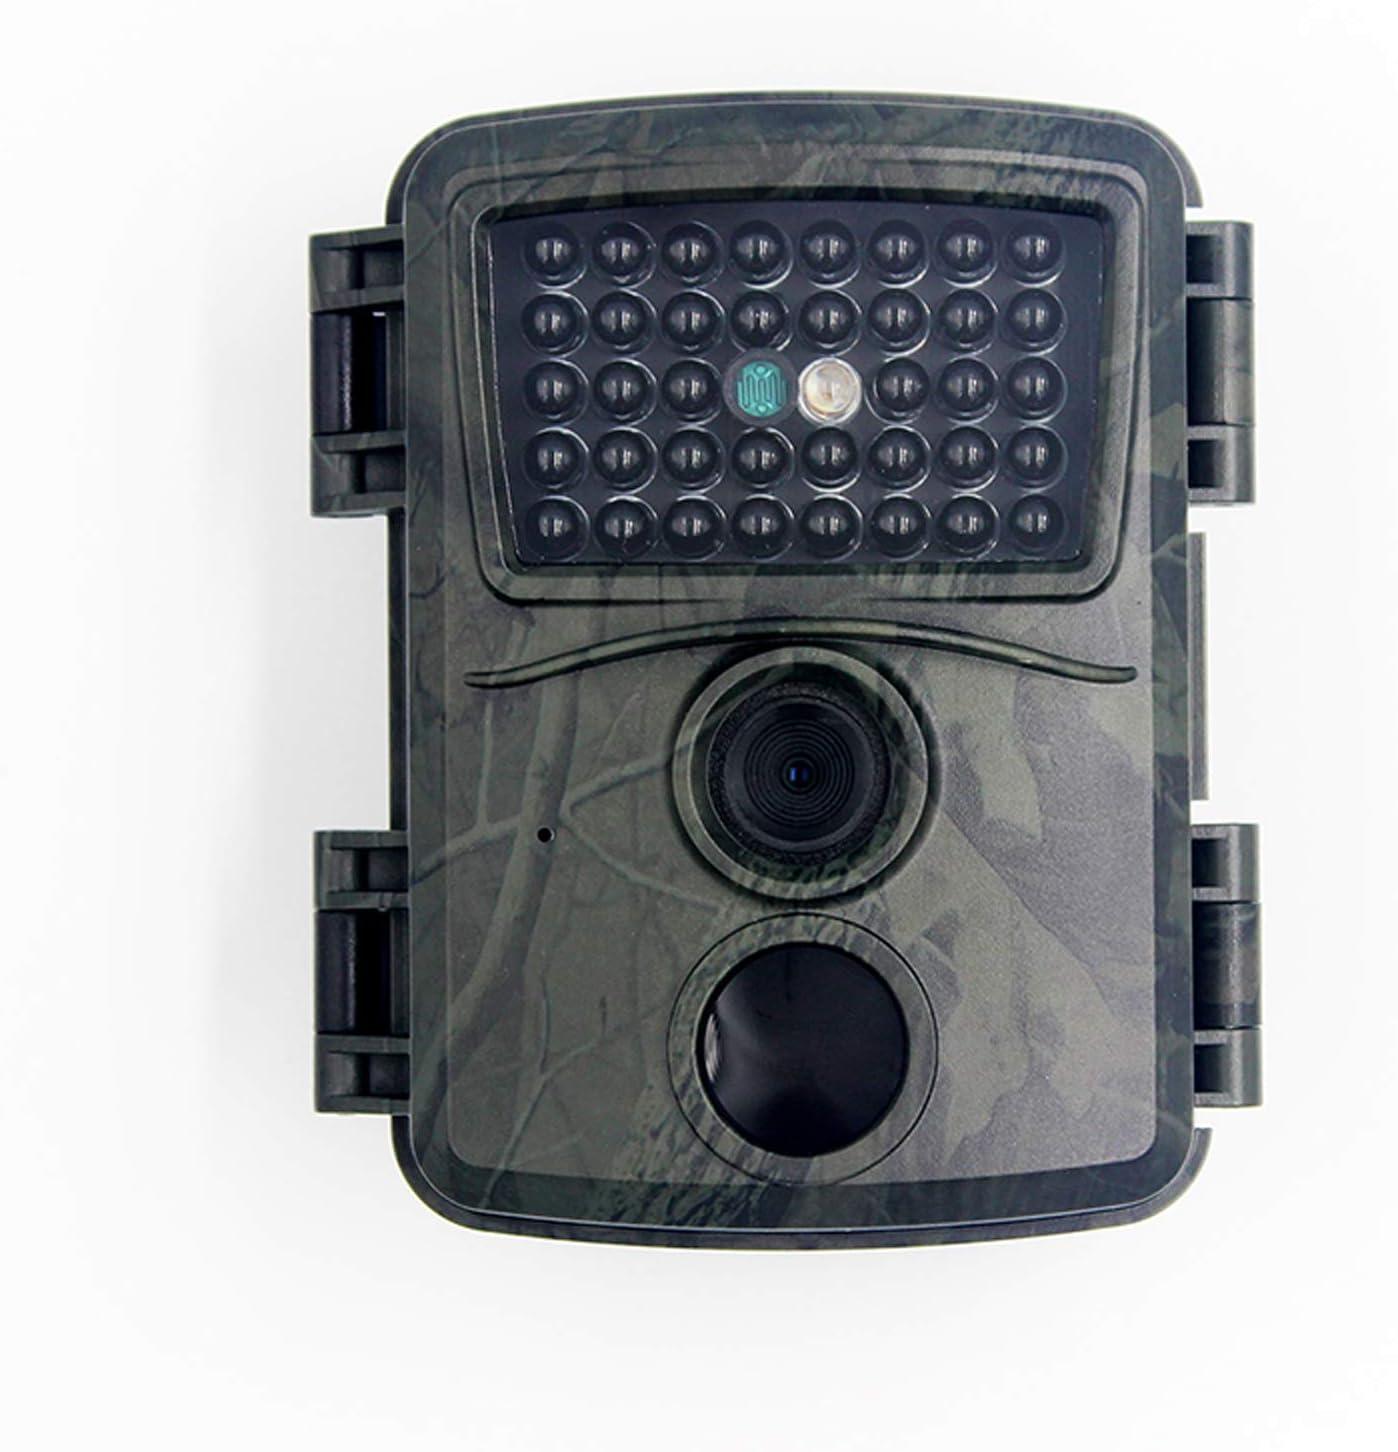 HIAO C9 Trail Camera,Hunting Camera with 38pcs IR LED, Wildlife Camera Monitoring ,1080P Infrared Night Vision Hunting Camera for Wildlife Monitoring, Garden, Home Security (1080P)